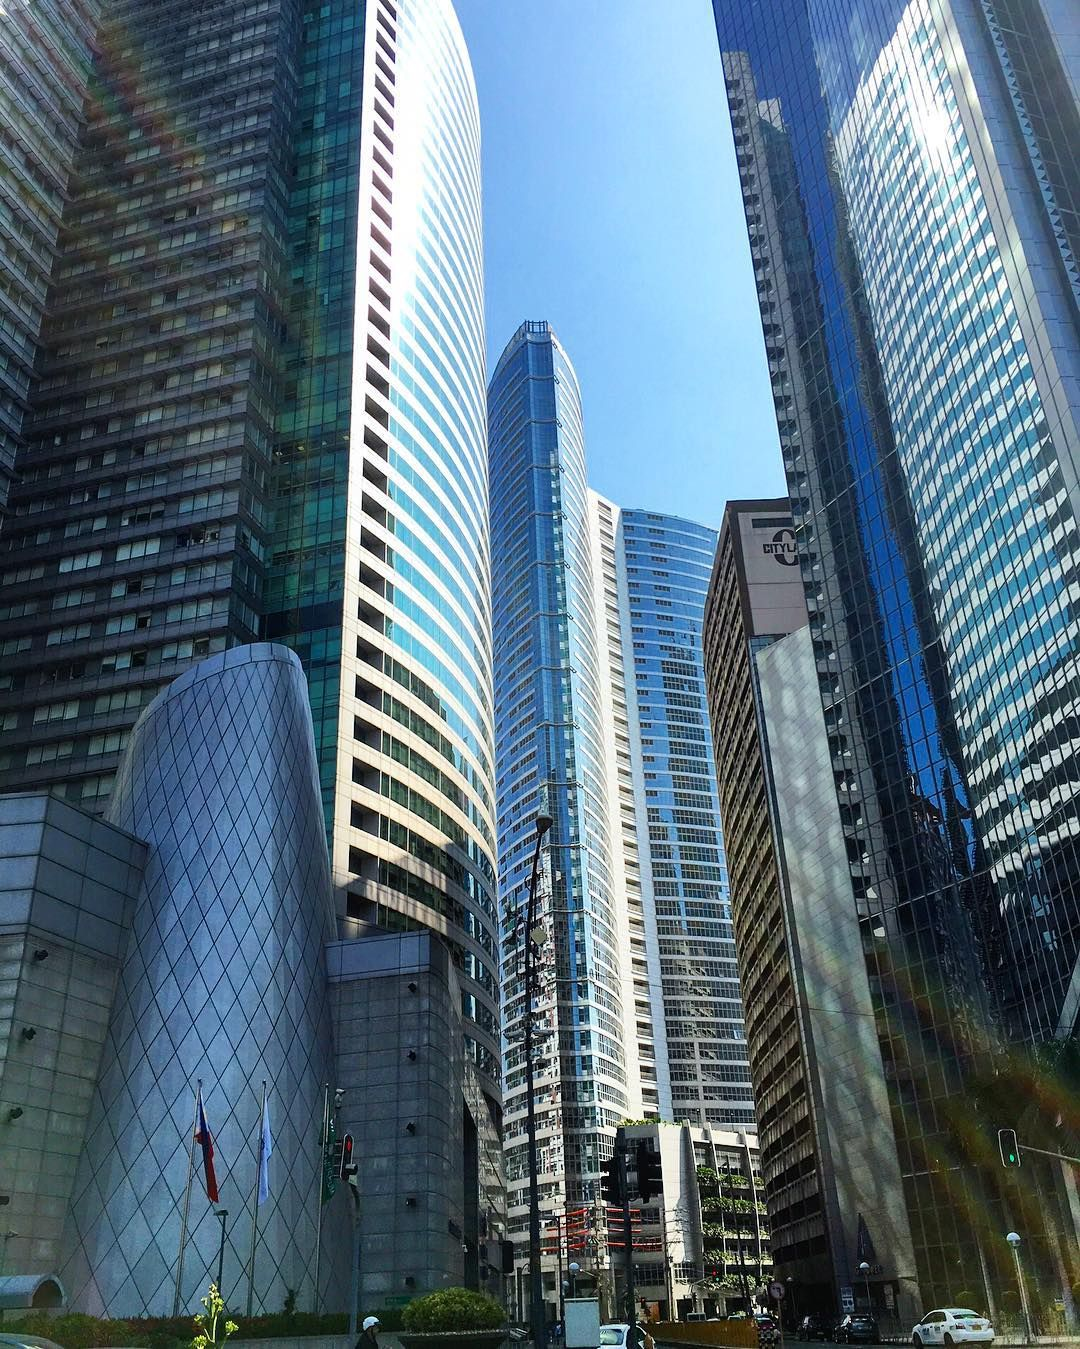 Metro Manila - Philippines - Page 319 - SkyscraperCity